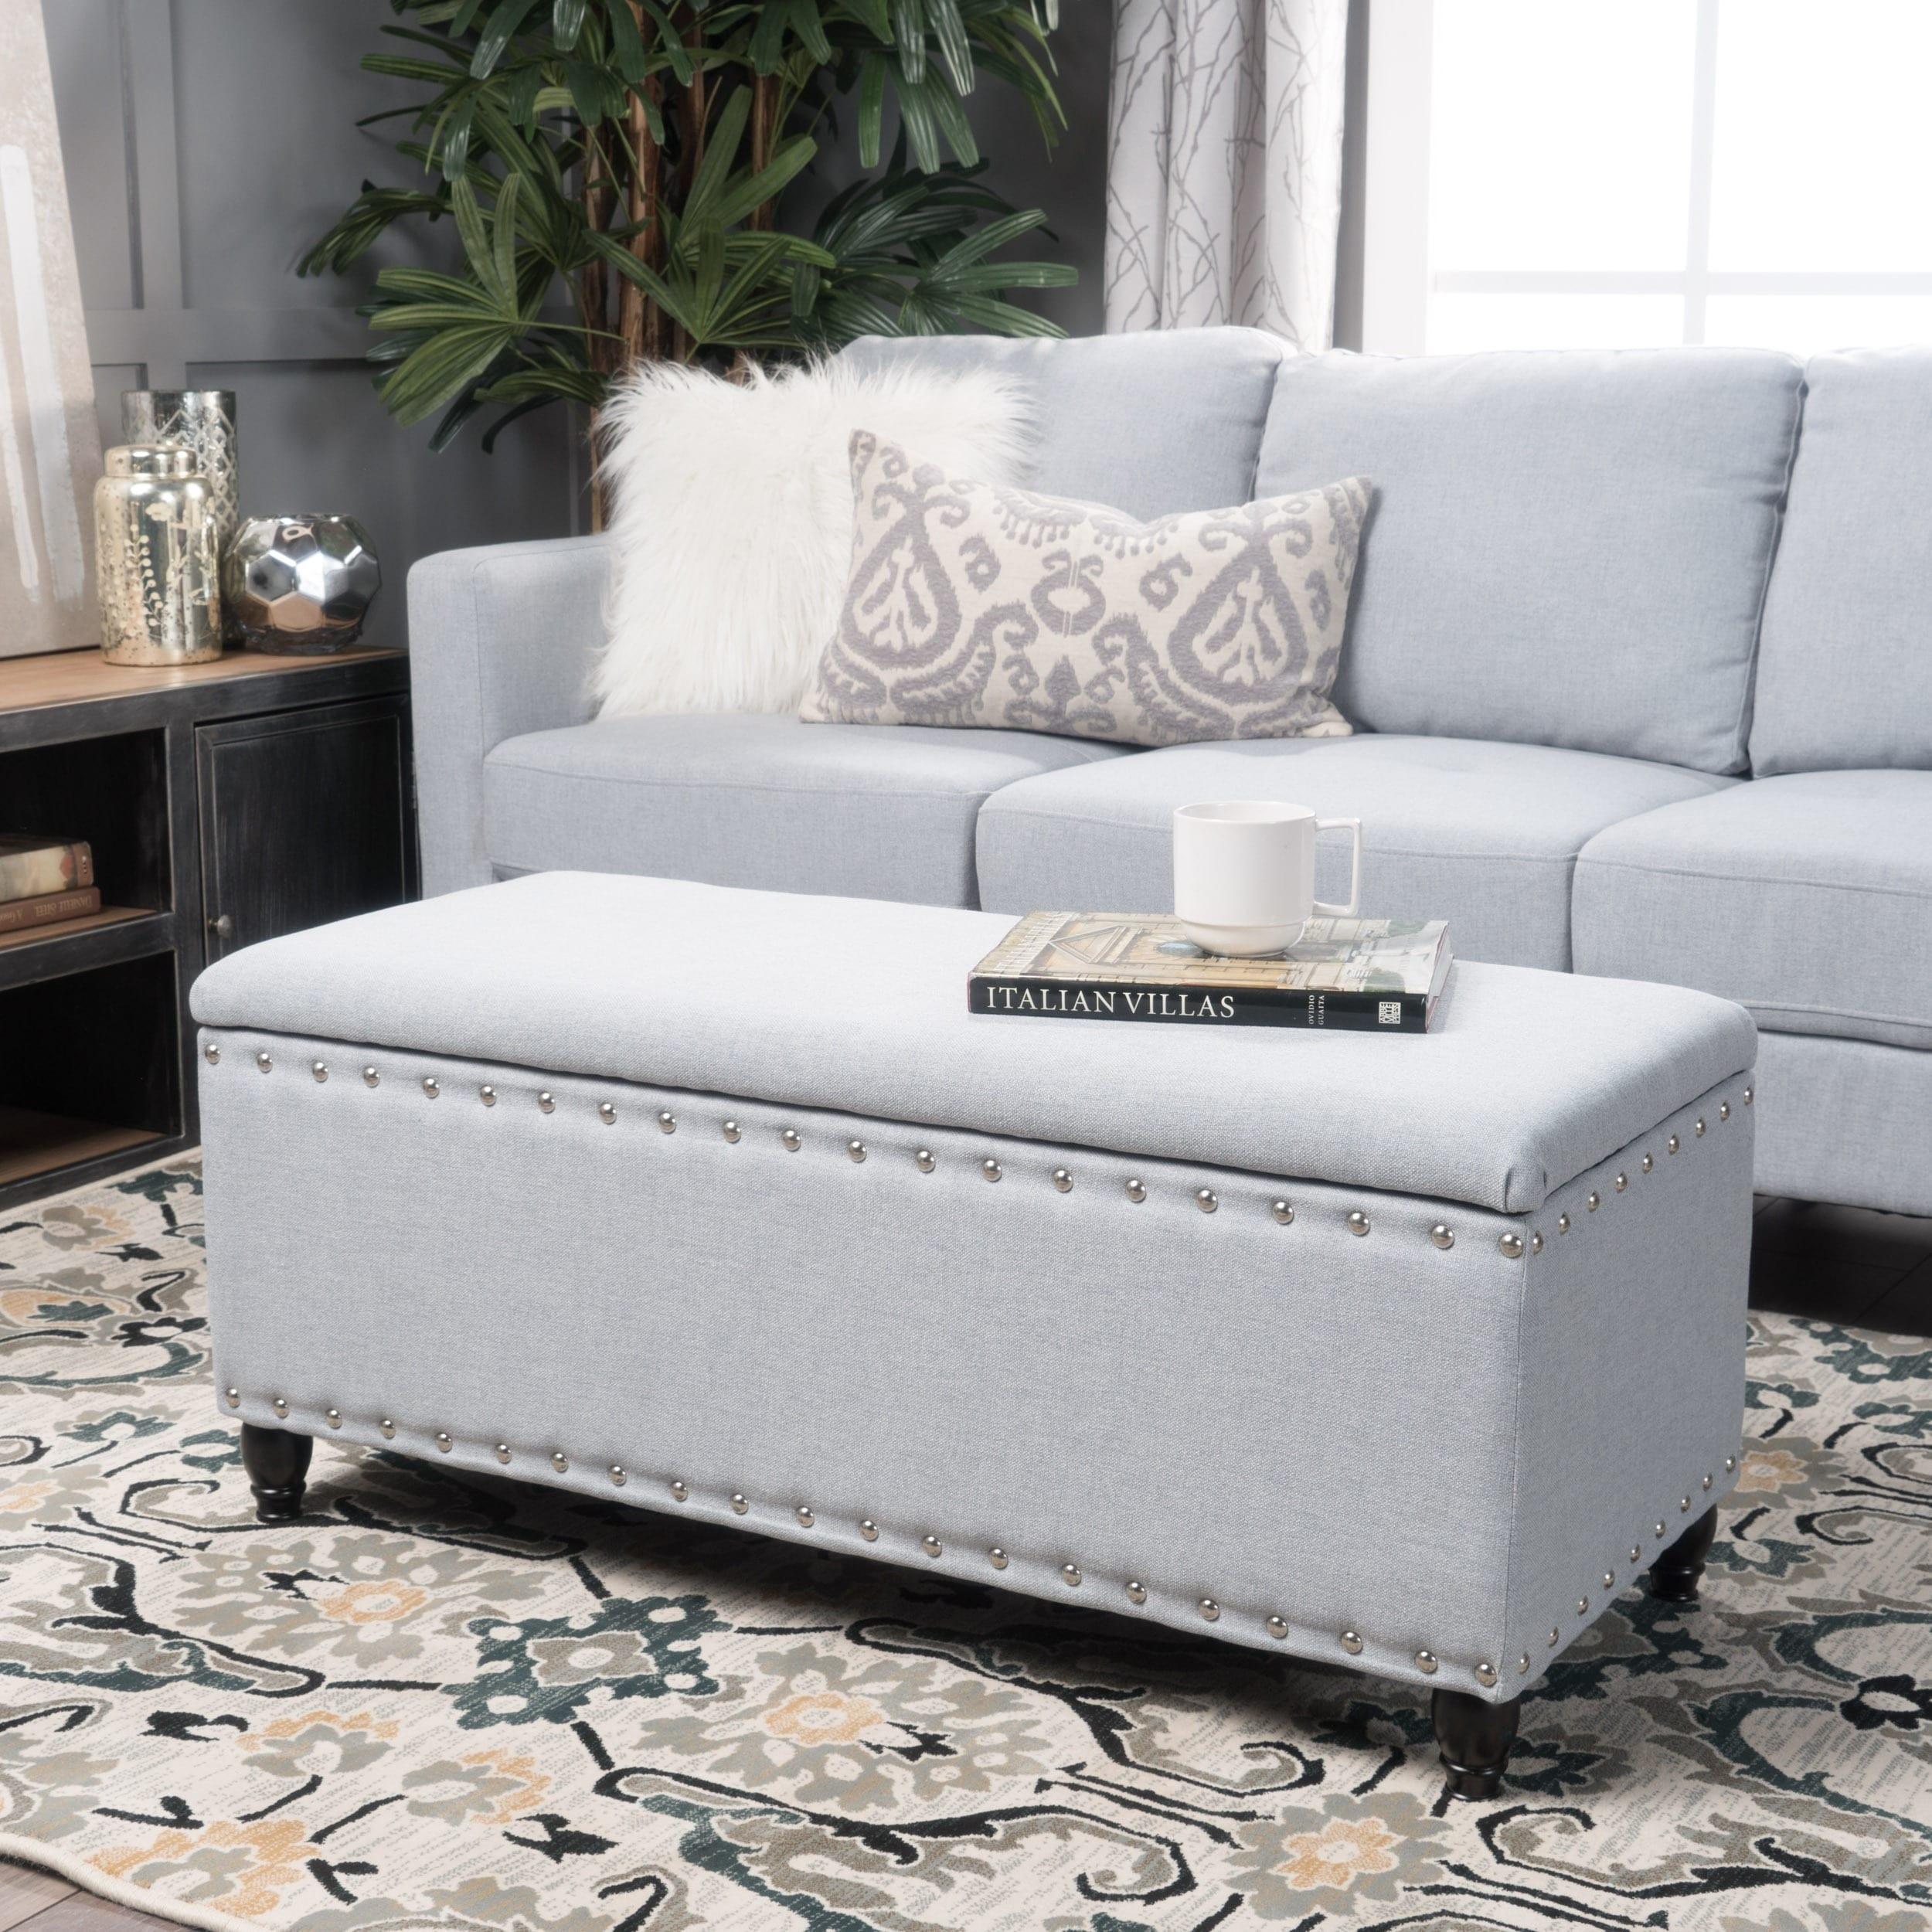 Sensational Buy Foot Stool Online At Overstock Our Best Living Room Andrewgaddart Wooden Chair Designs For Living Room Andrewgaddartcom